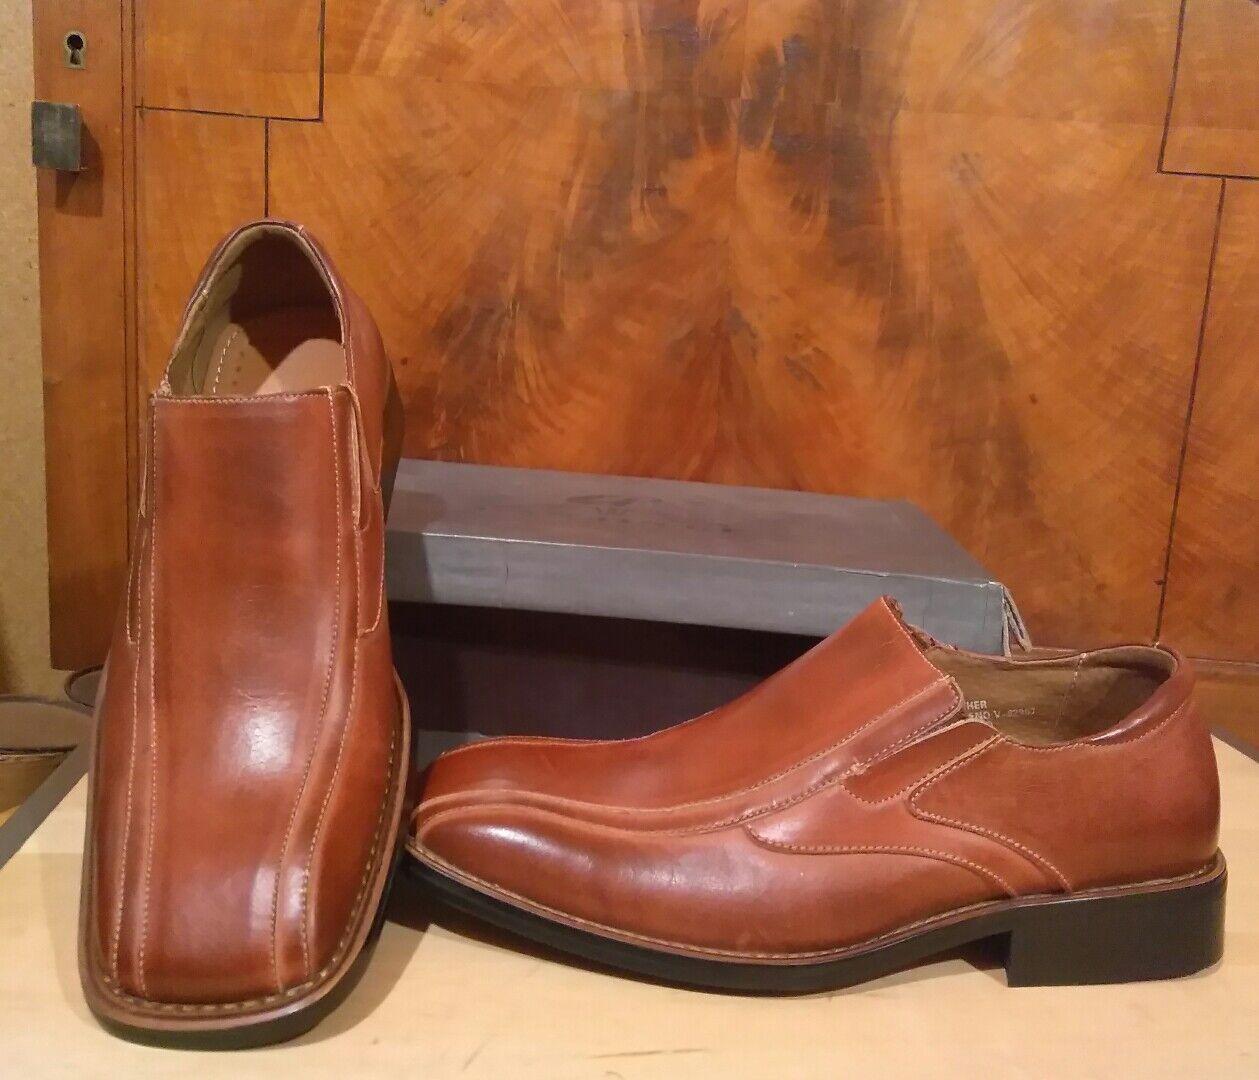 Mens Leather Dress shoes  Medium Brown Square toe Slip On  Loafer Wan Jinge NIB